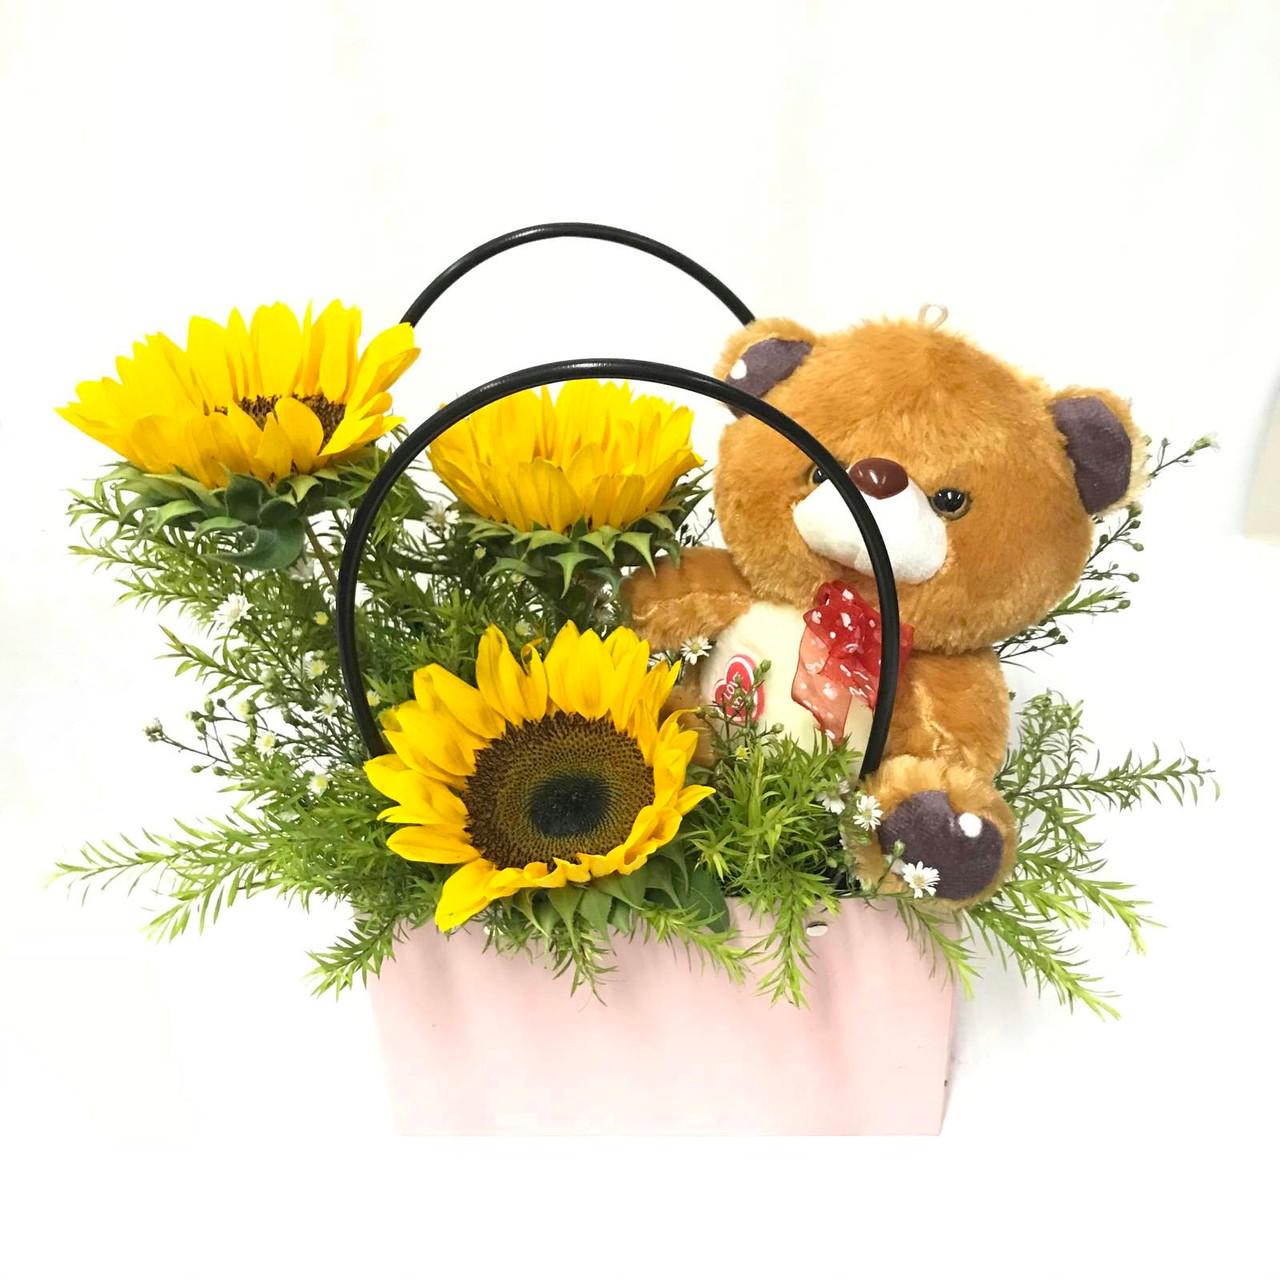 Sunflowers & Teddy Handbag